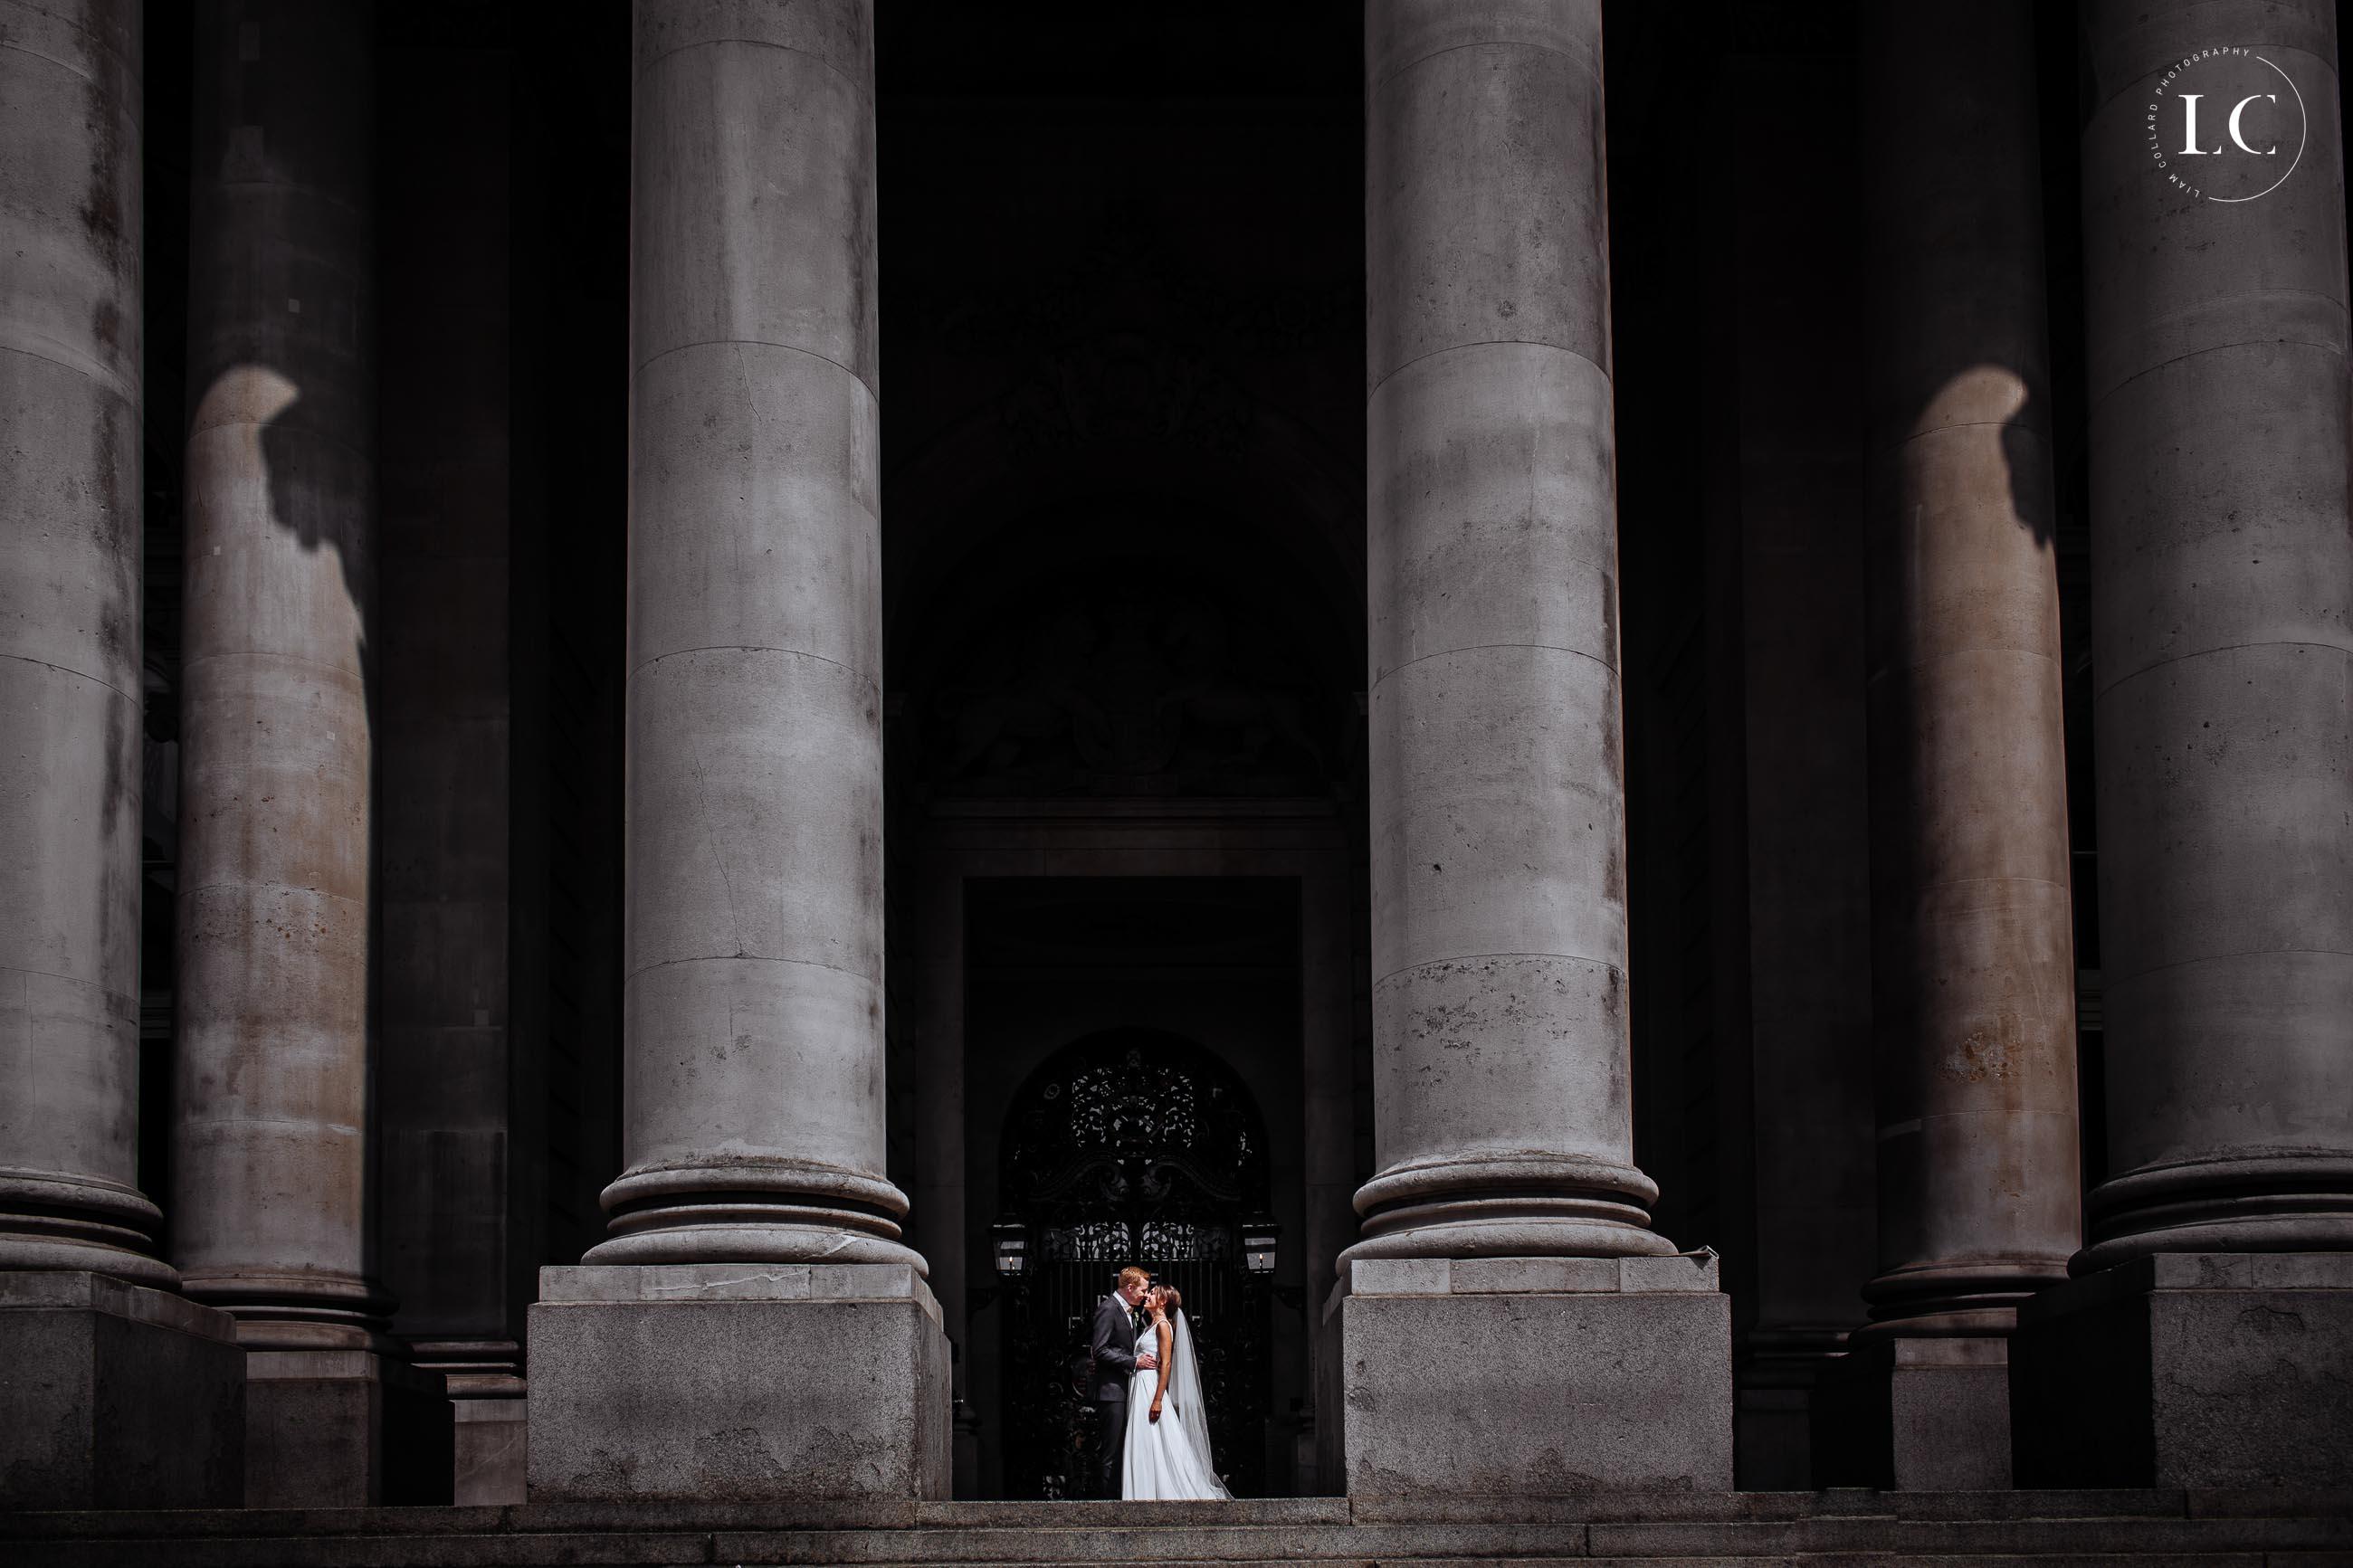 Bride and groom between two pillars